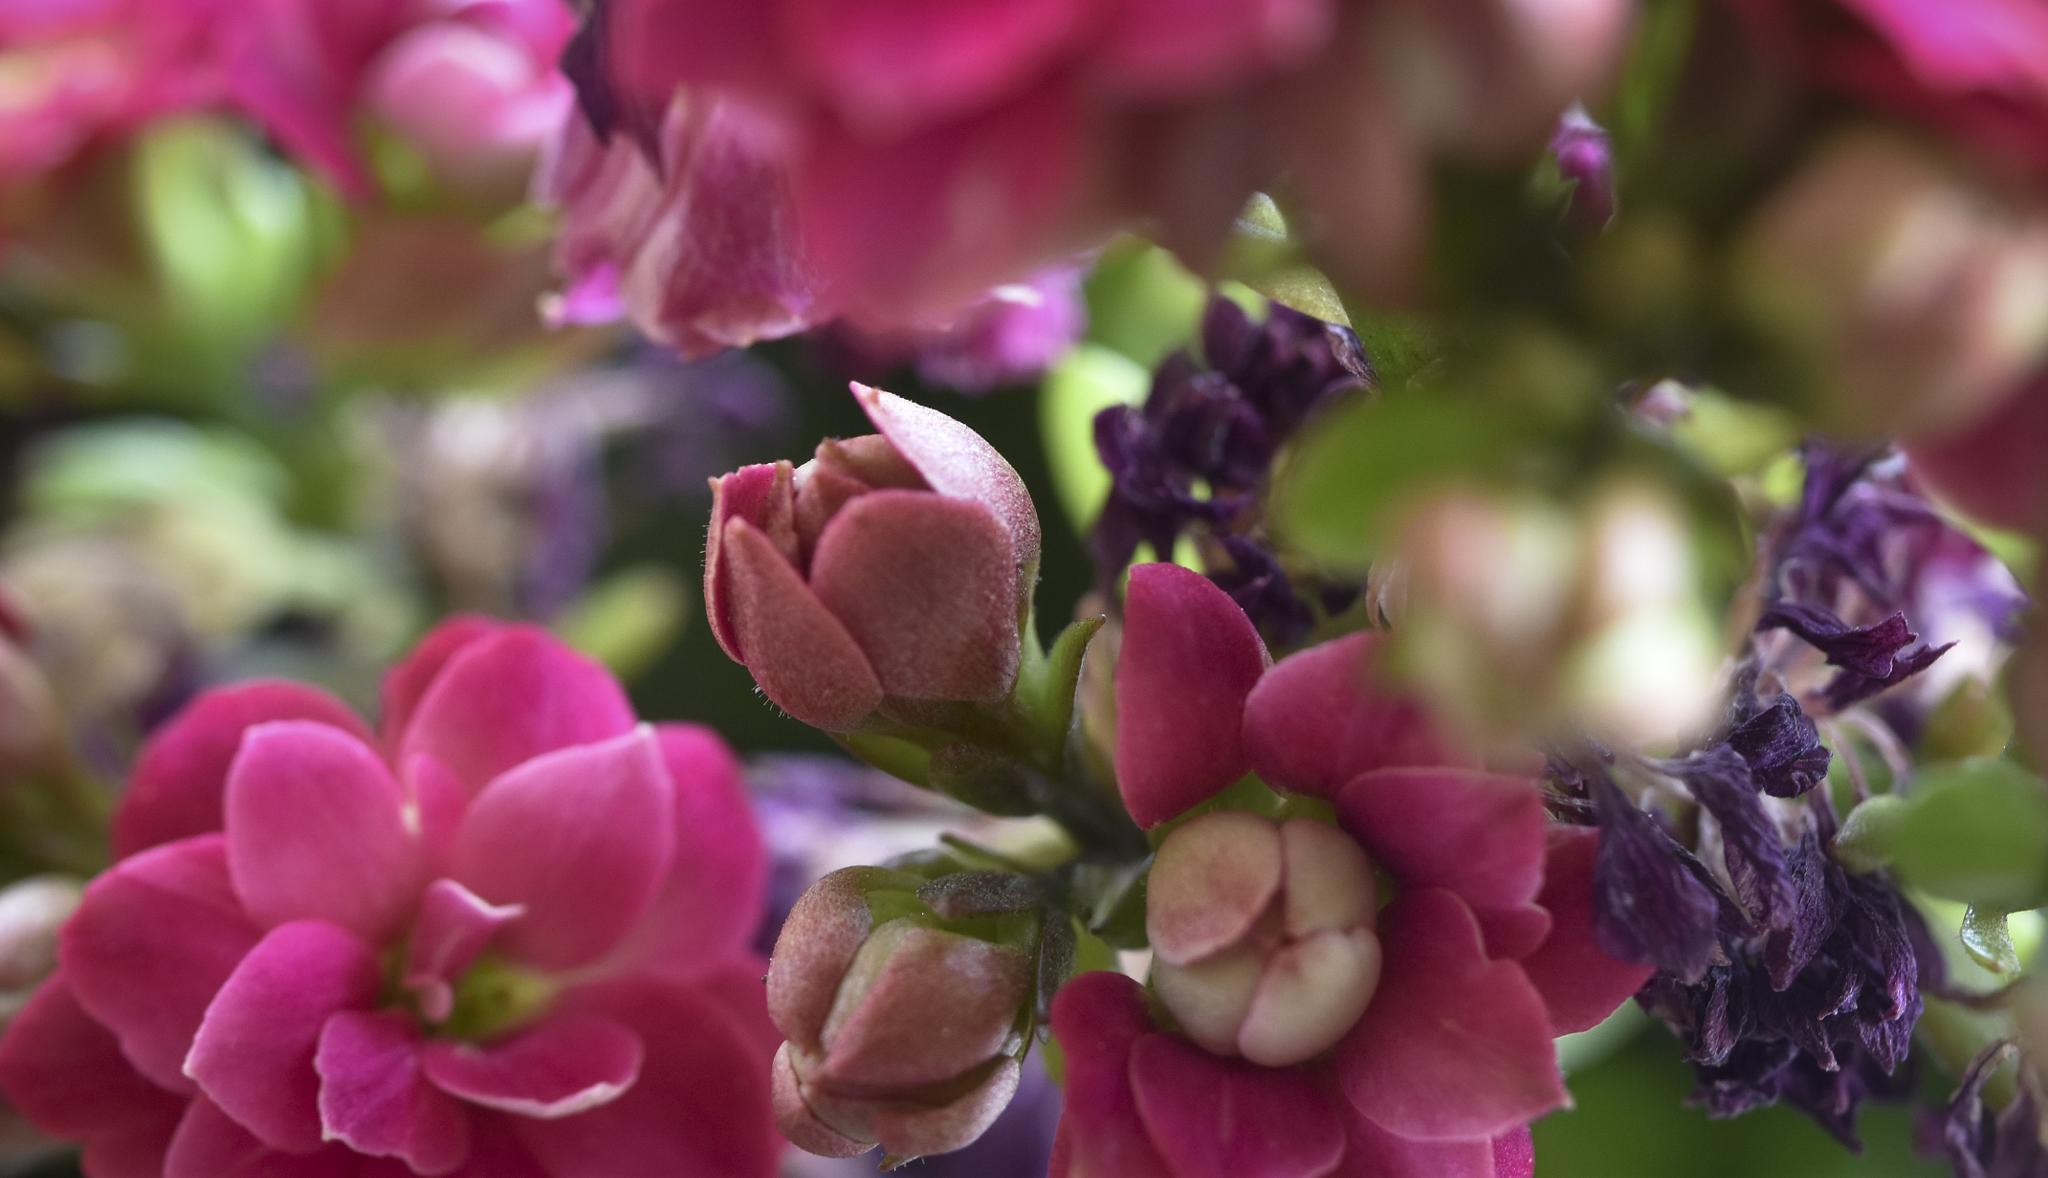 Tiny Flower by maurofonseca